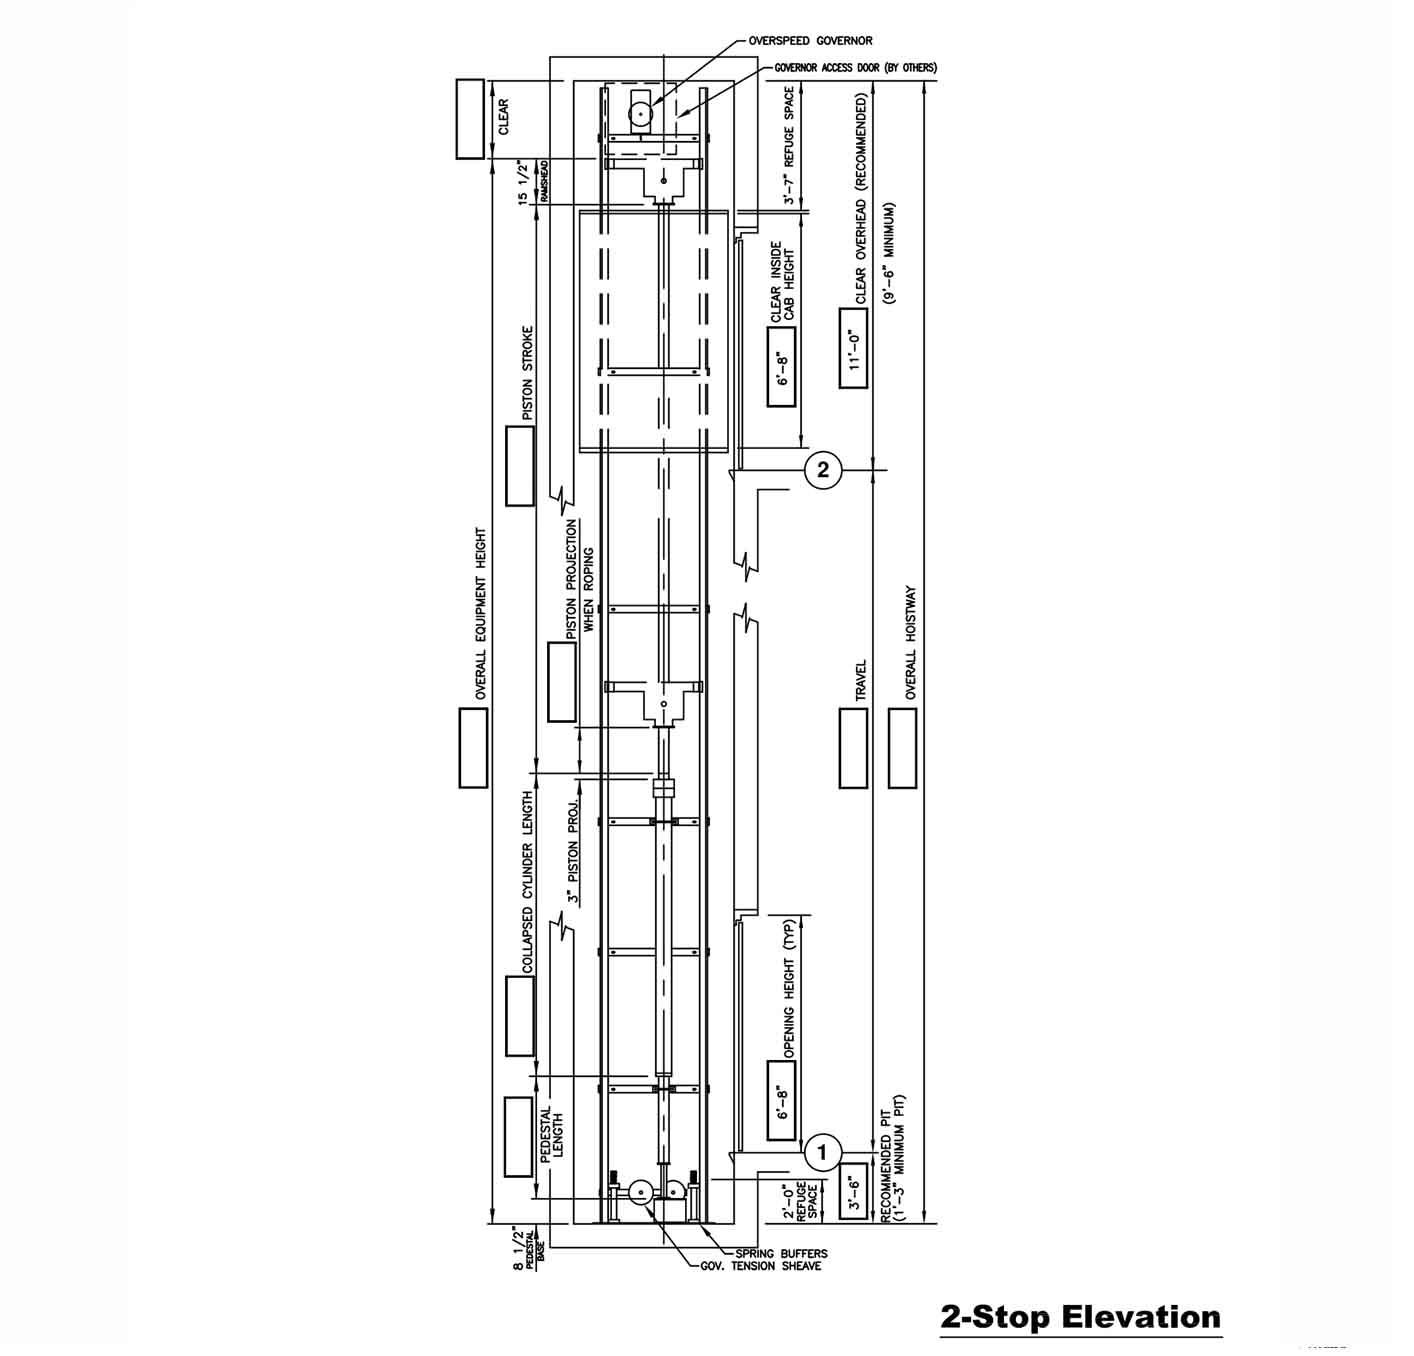 Lula Drawings Custom Elevator Circuit Diagram 2 Stop Elevation